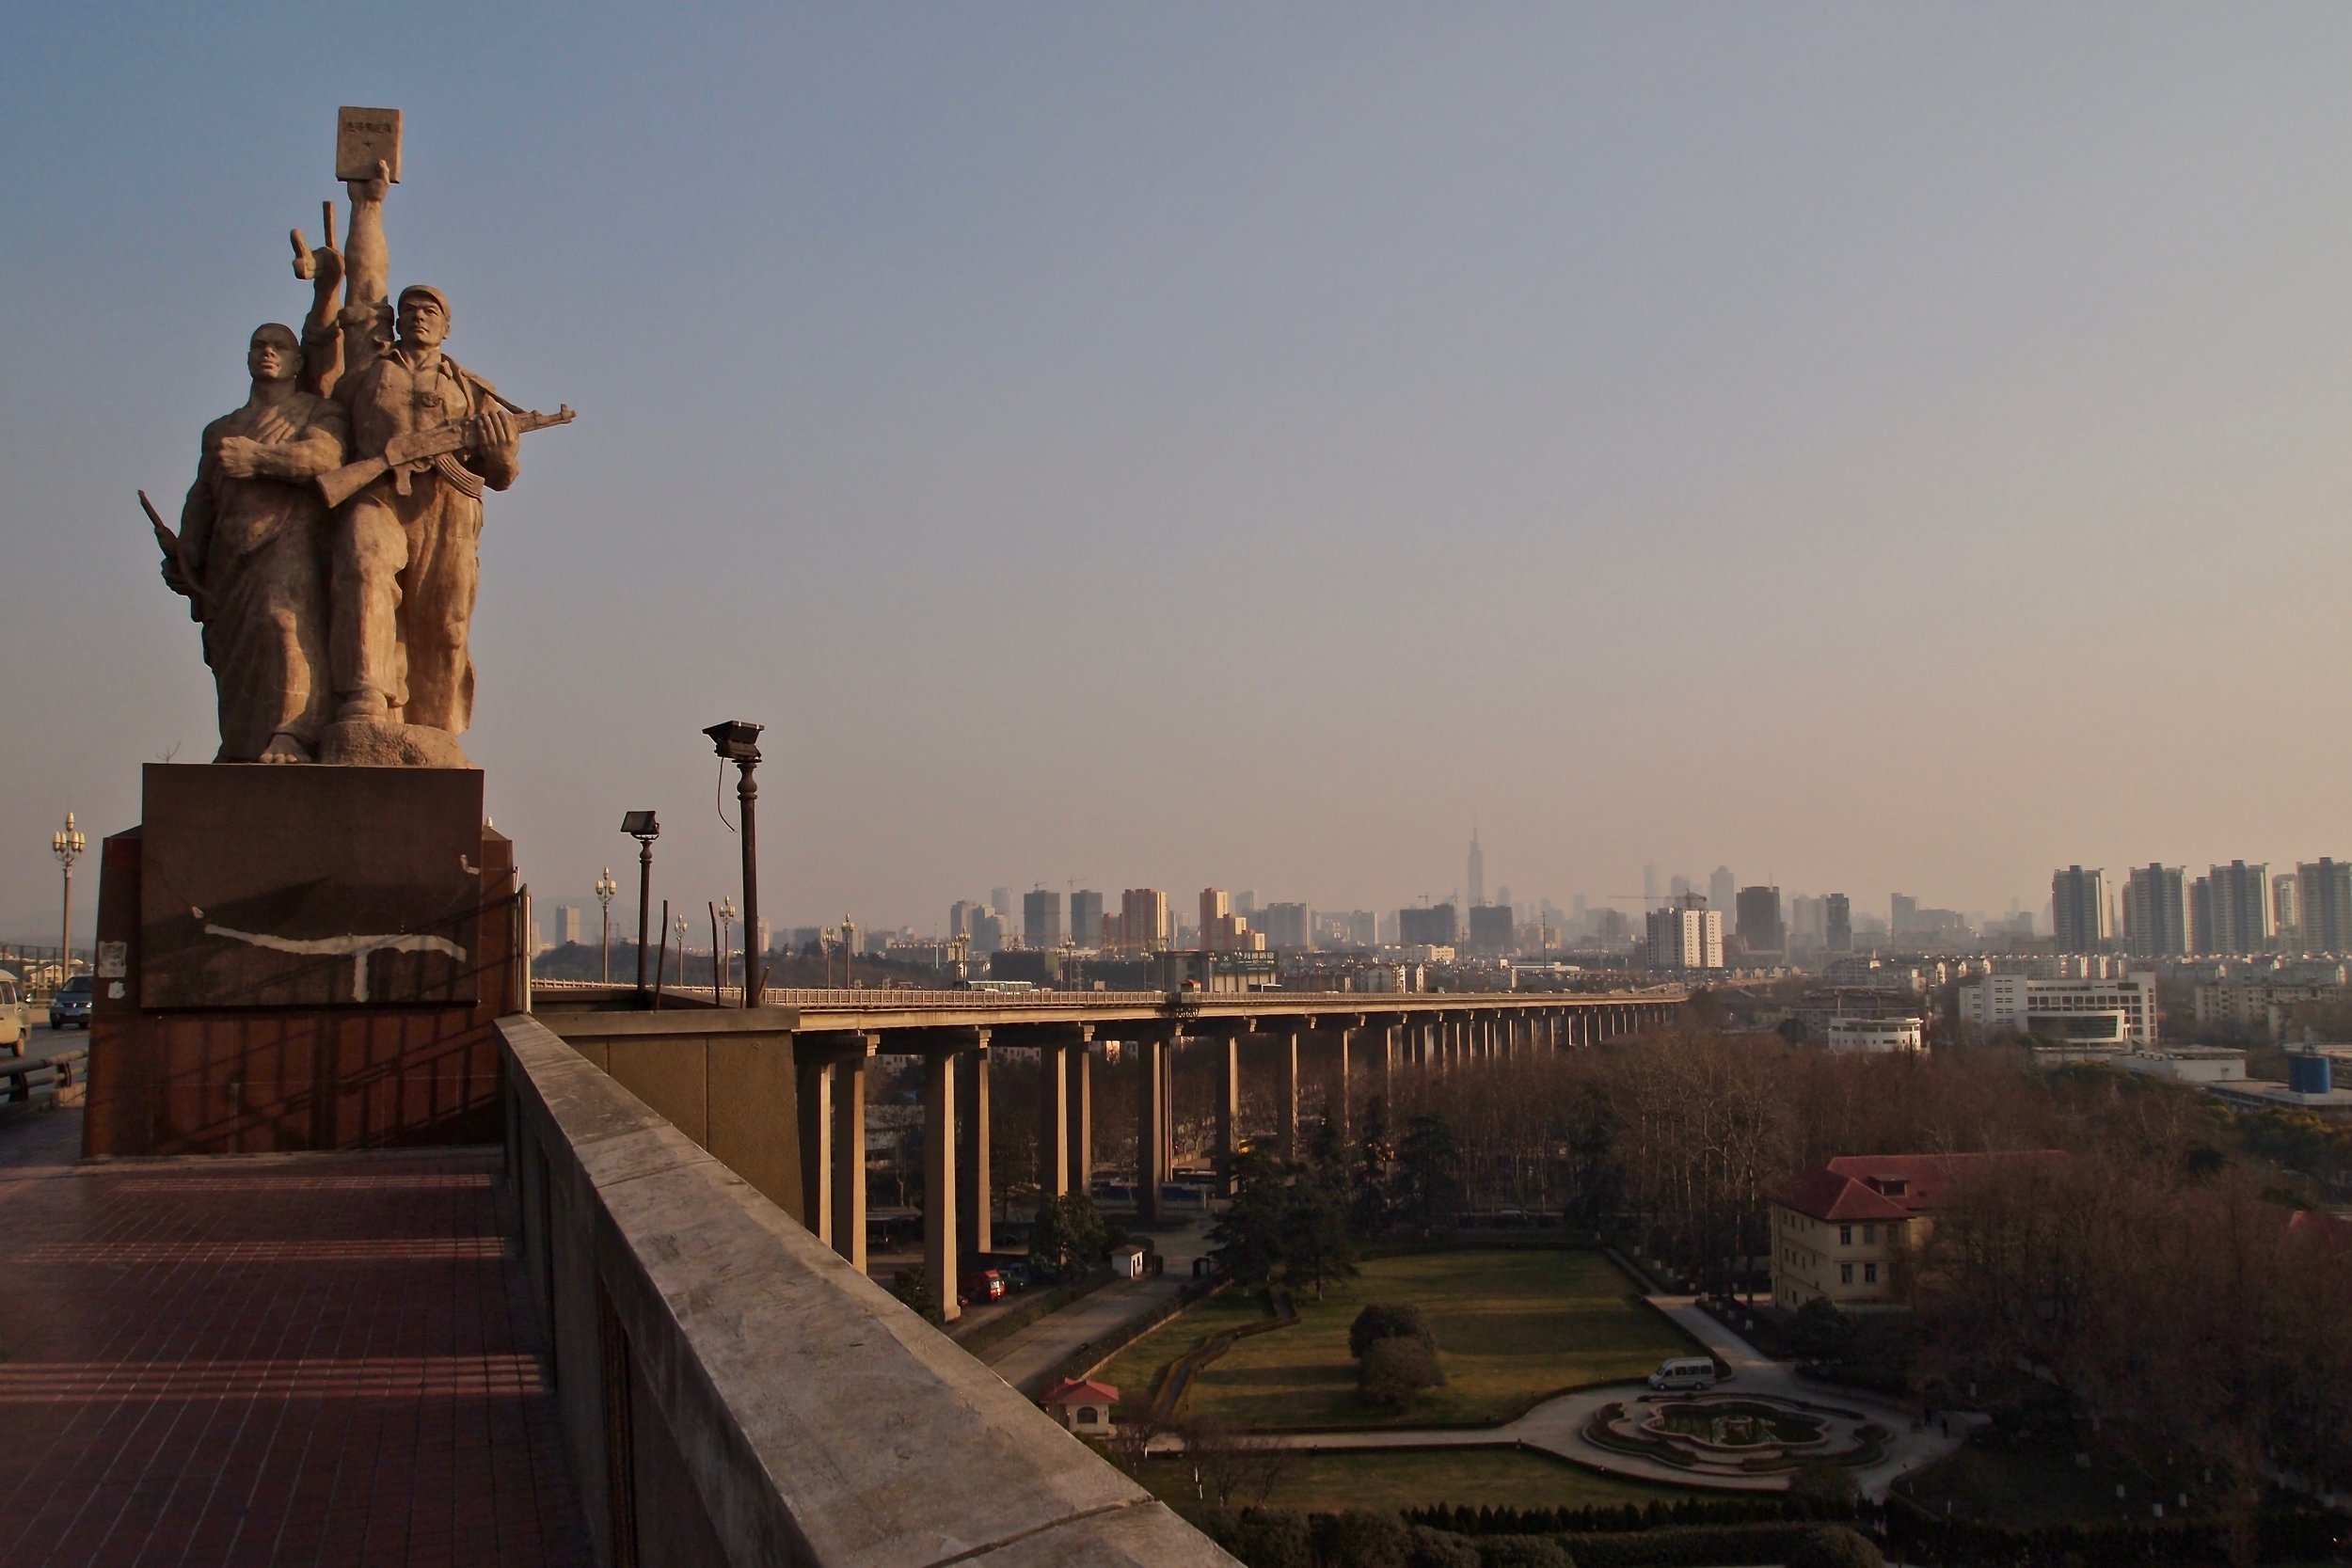 The Yangtze River Bridge in Nanjing, China. Photo: (C) Remko Tanis